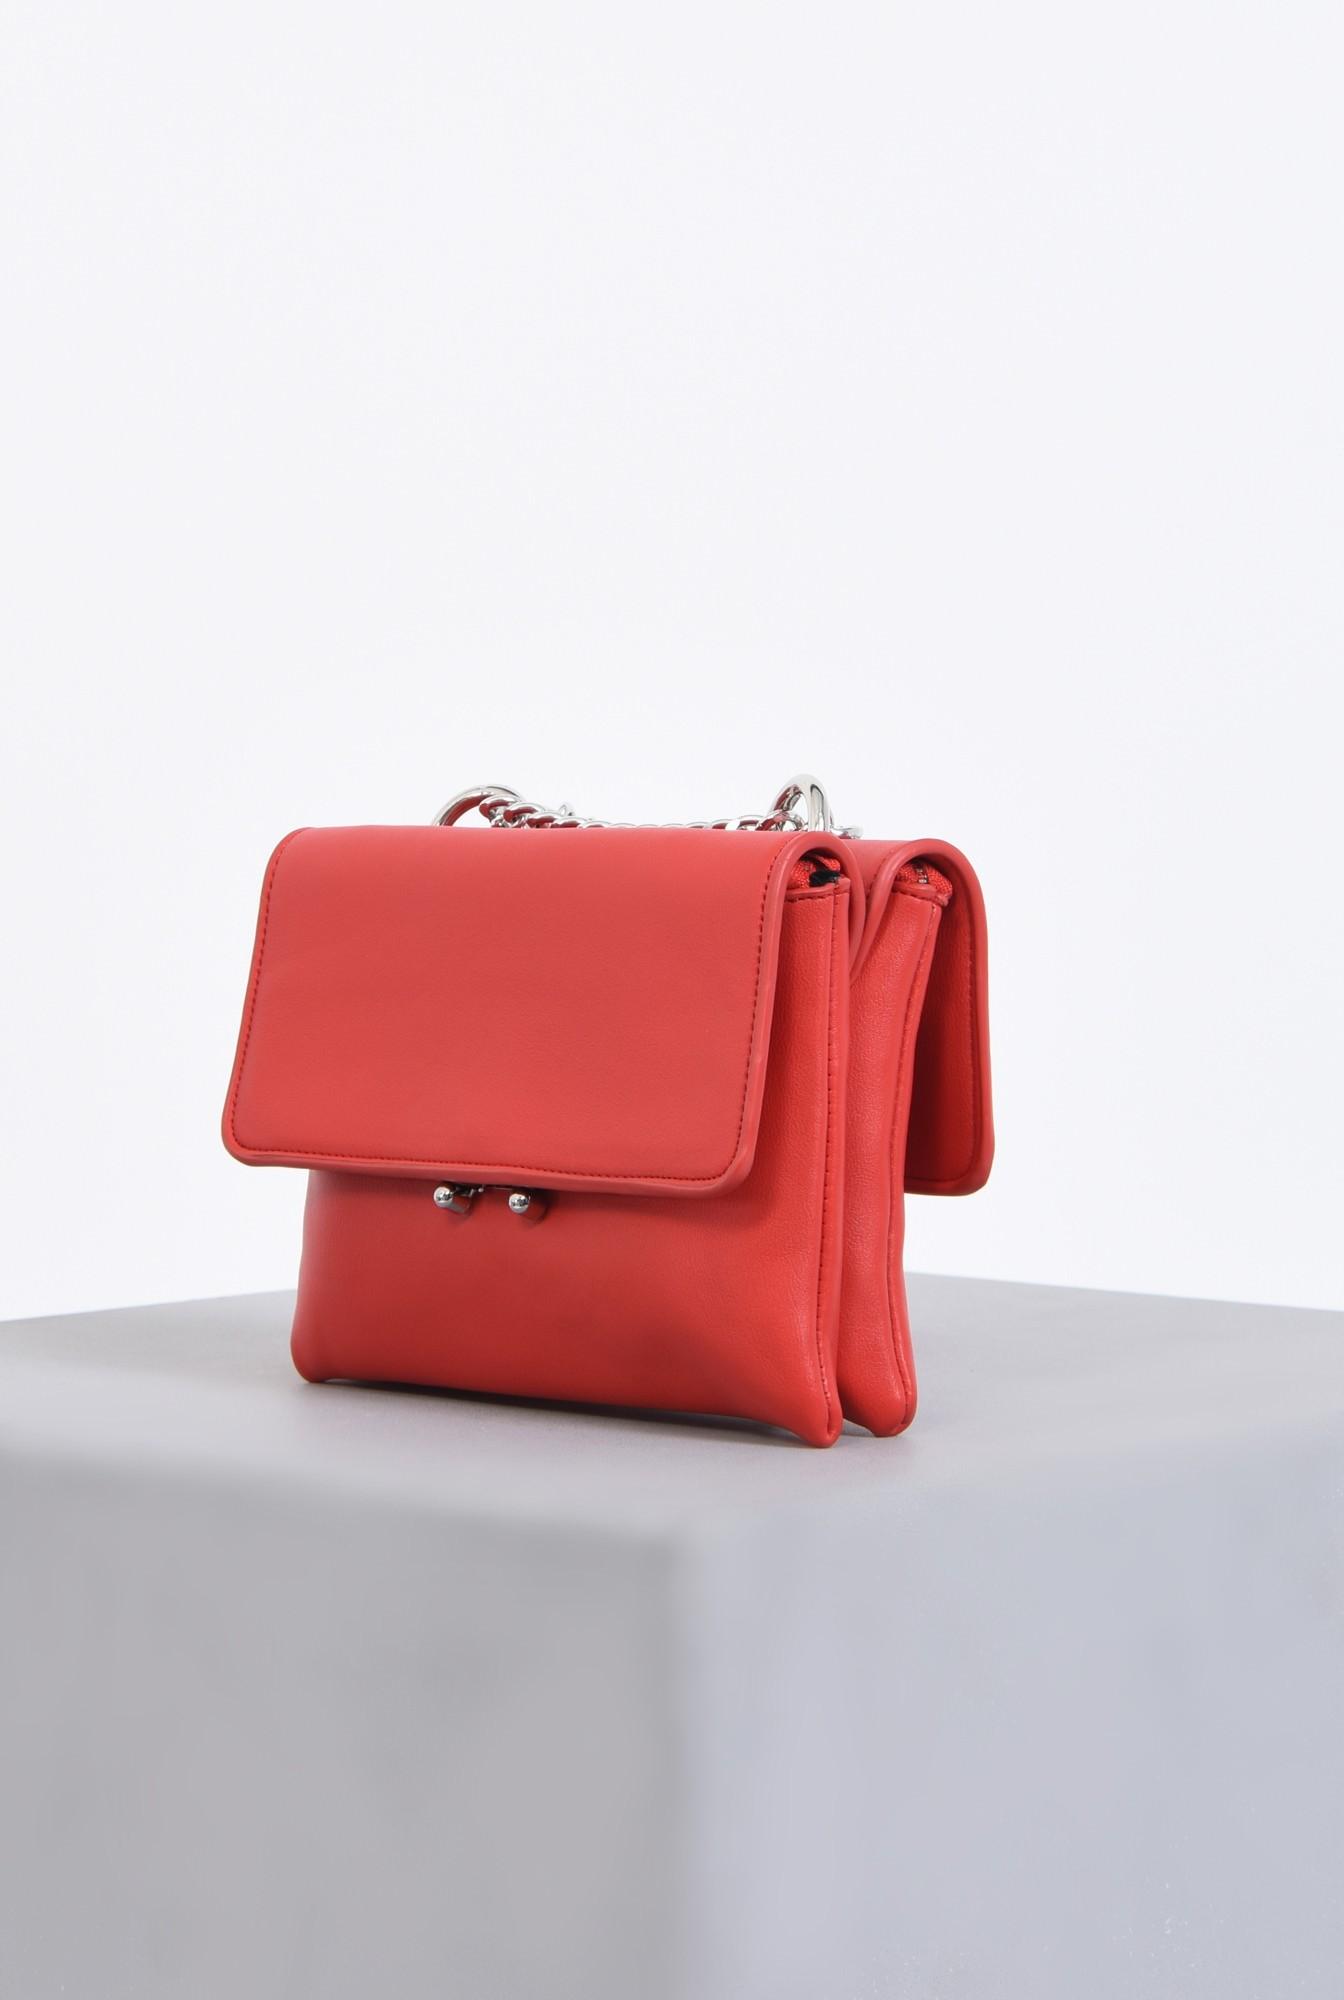 1 - geanta casual, mini, rosu, lant